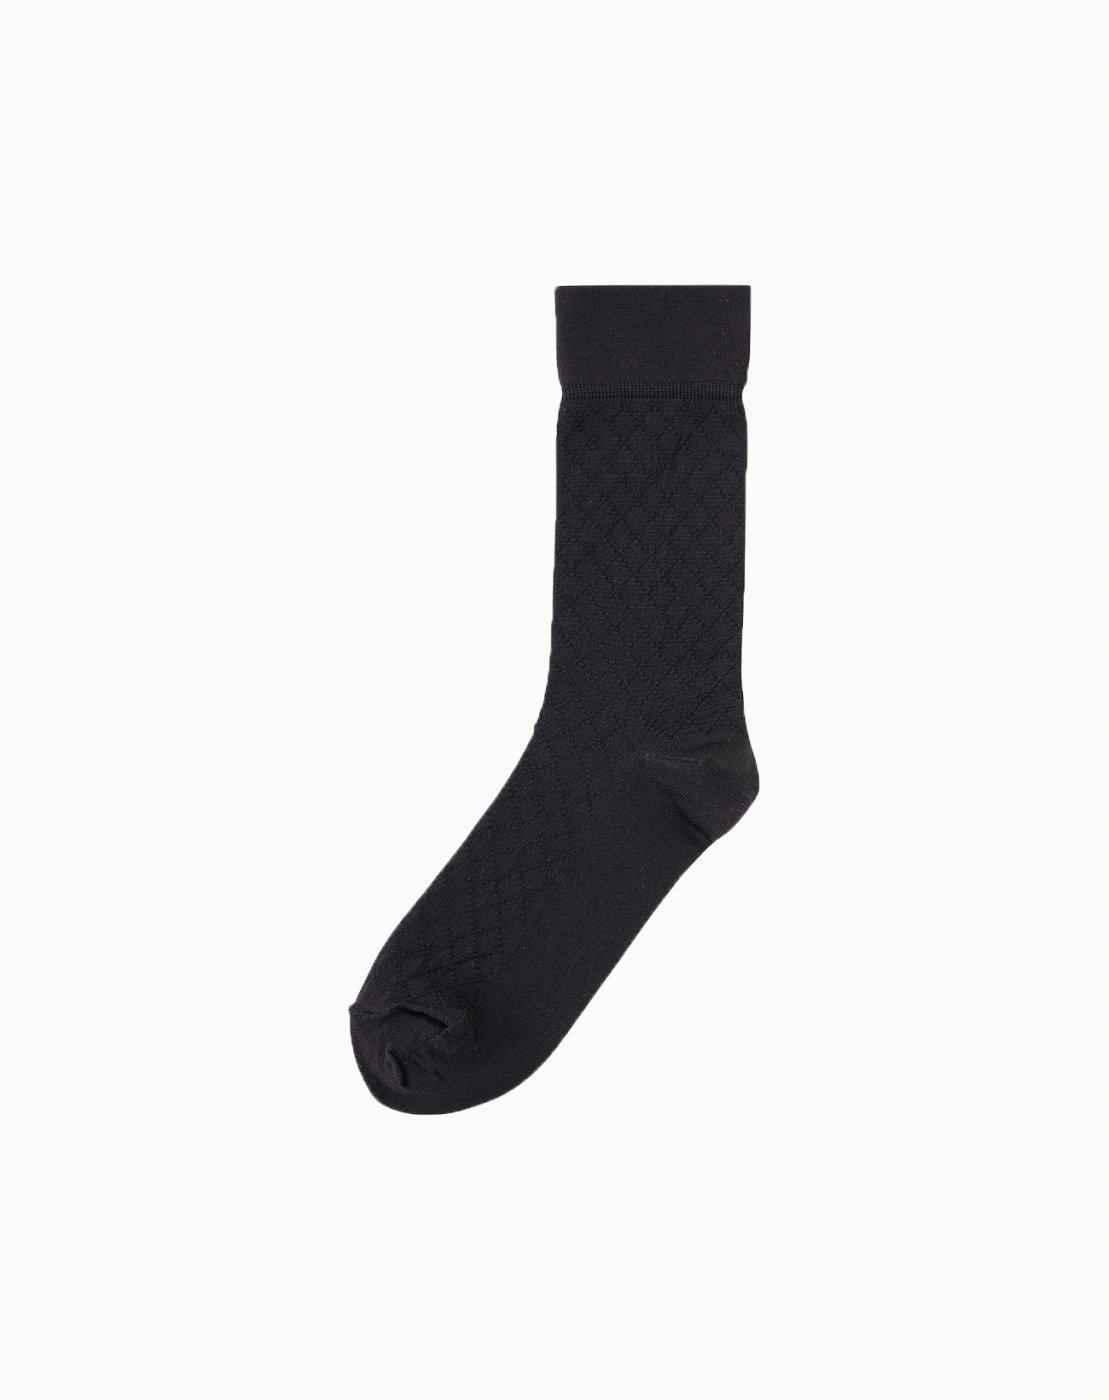 leur logette - Mesh Socks - Black